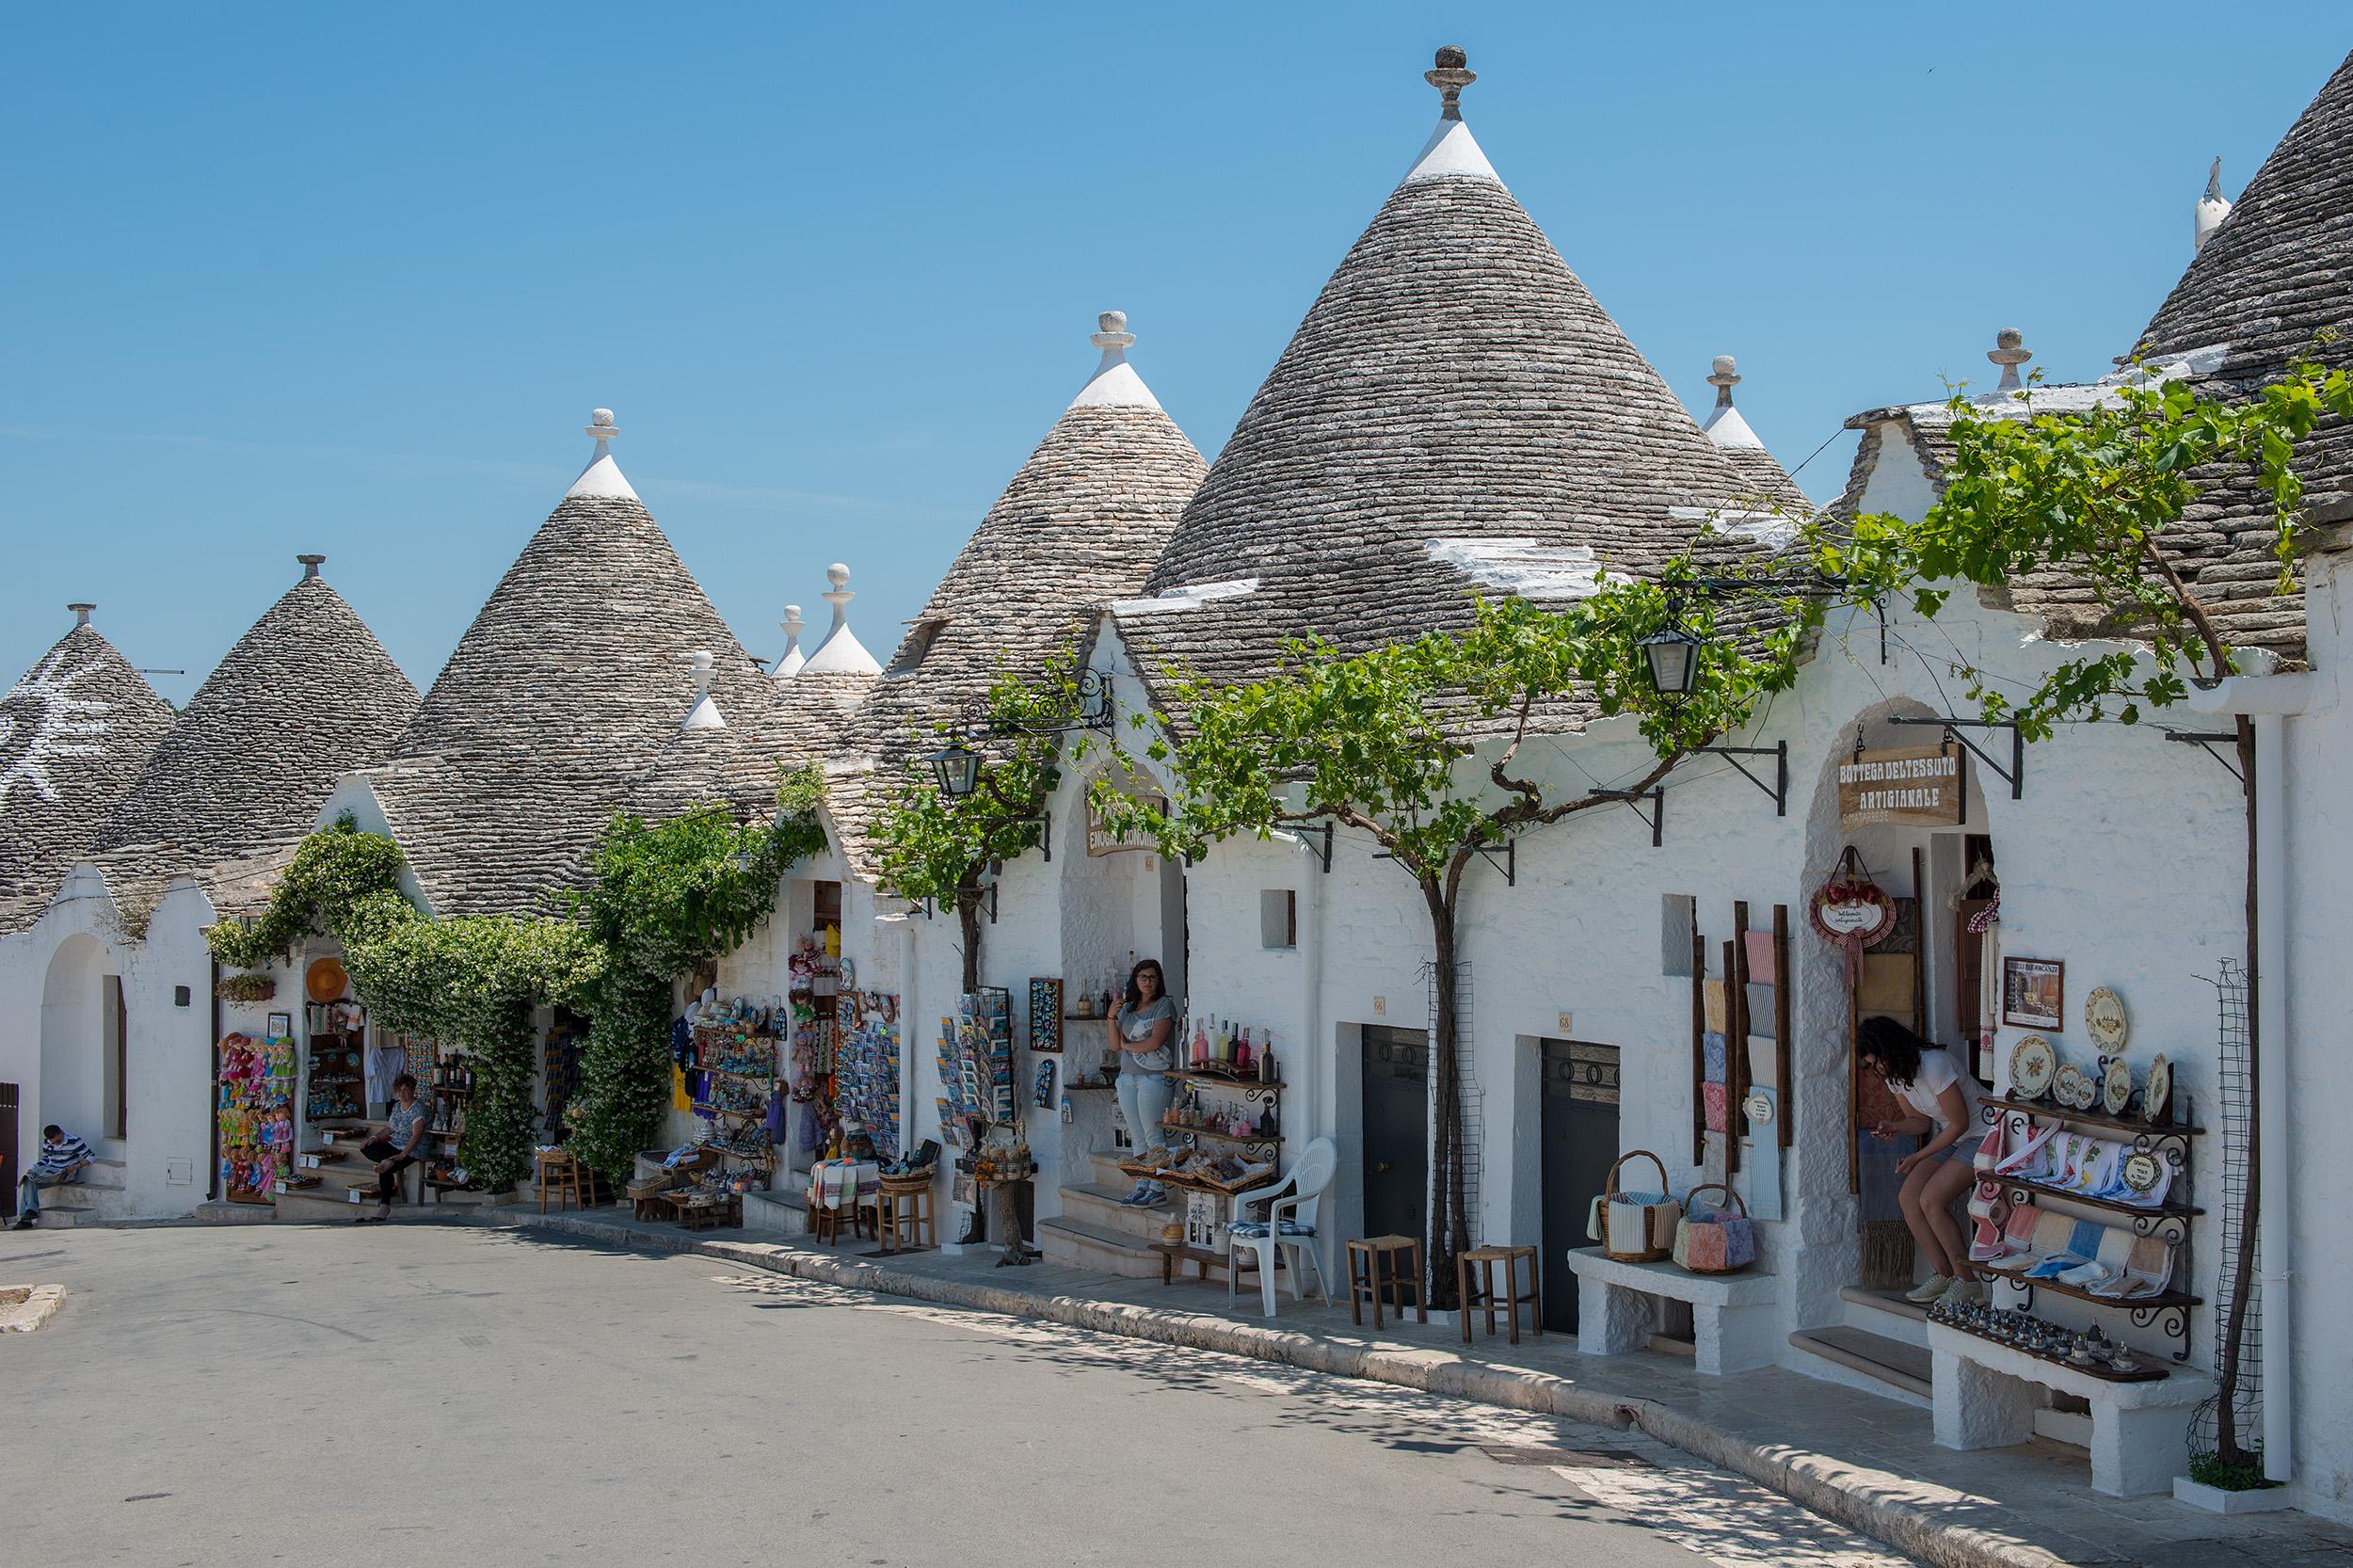 2014 • Puglia, Italy